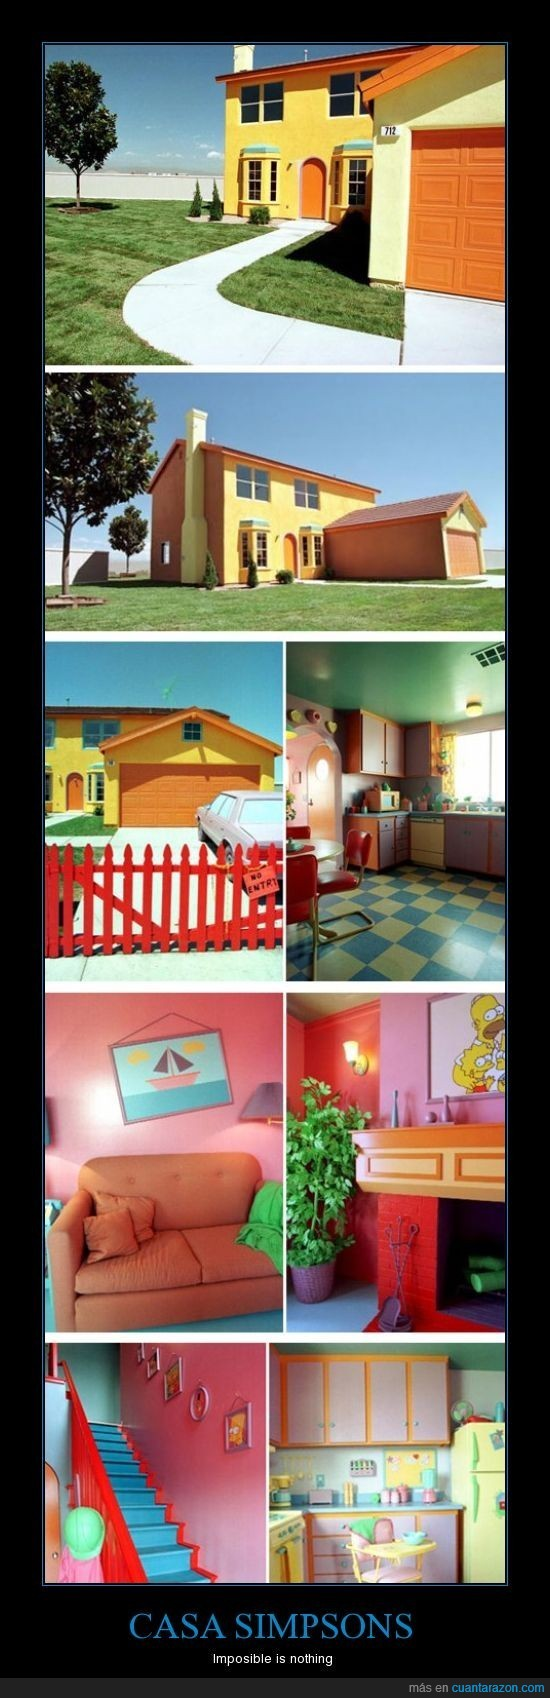 casa,real,simpsons